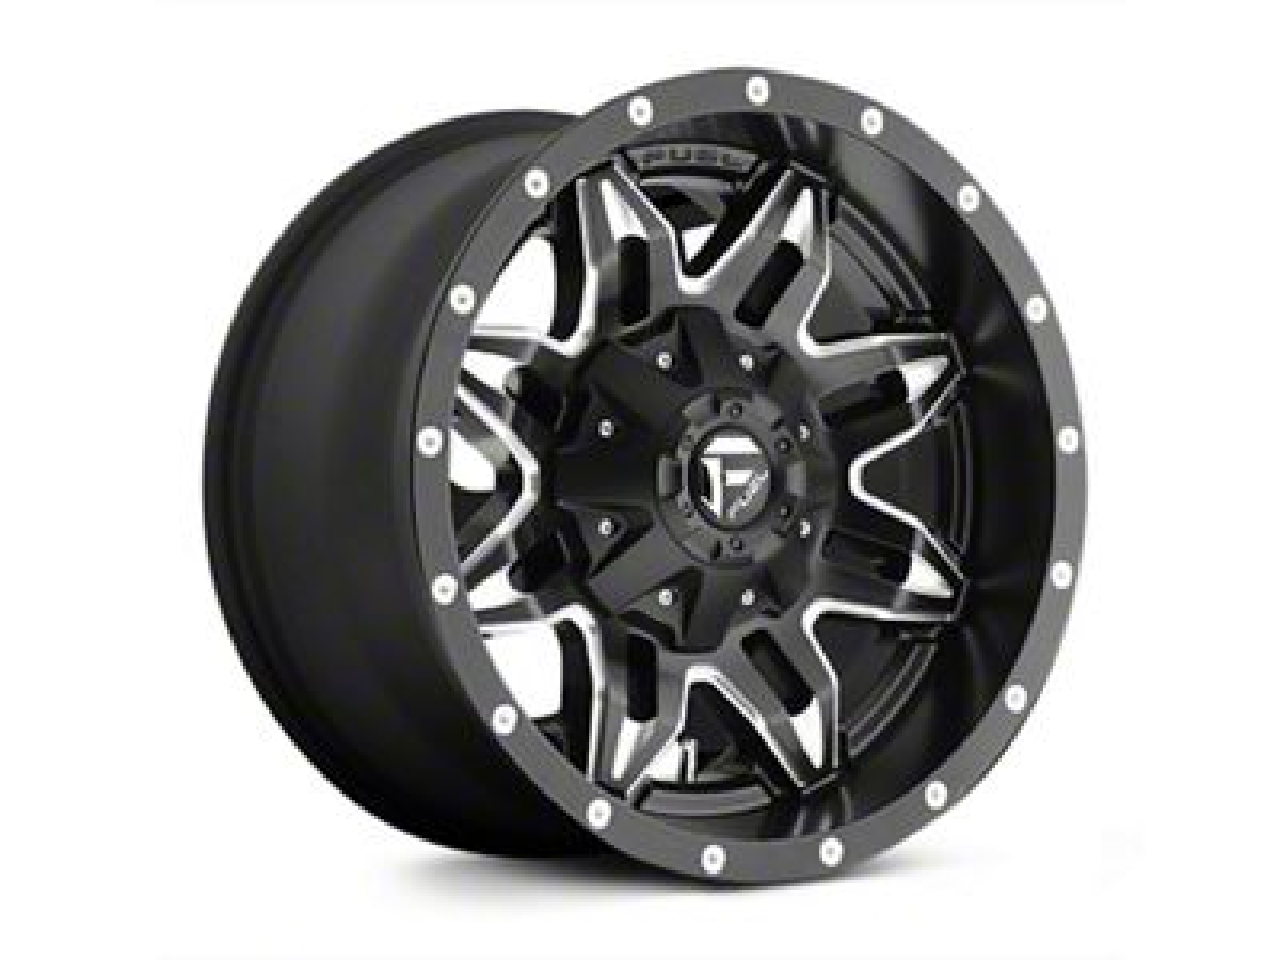 Fuel Wheels Lethal Black Milled Wheel - 20x10 (18-19 Jeep Wrangler JL)